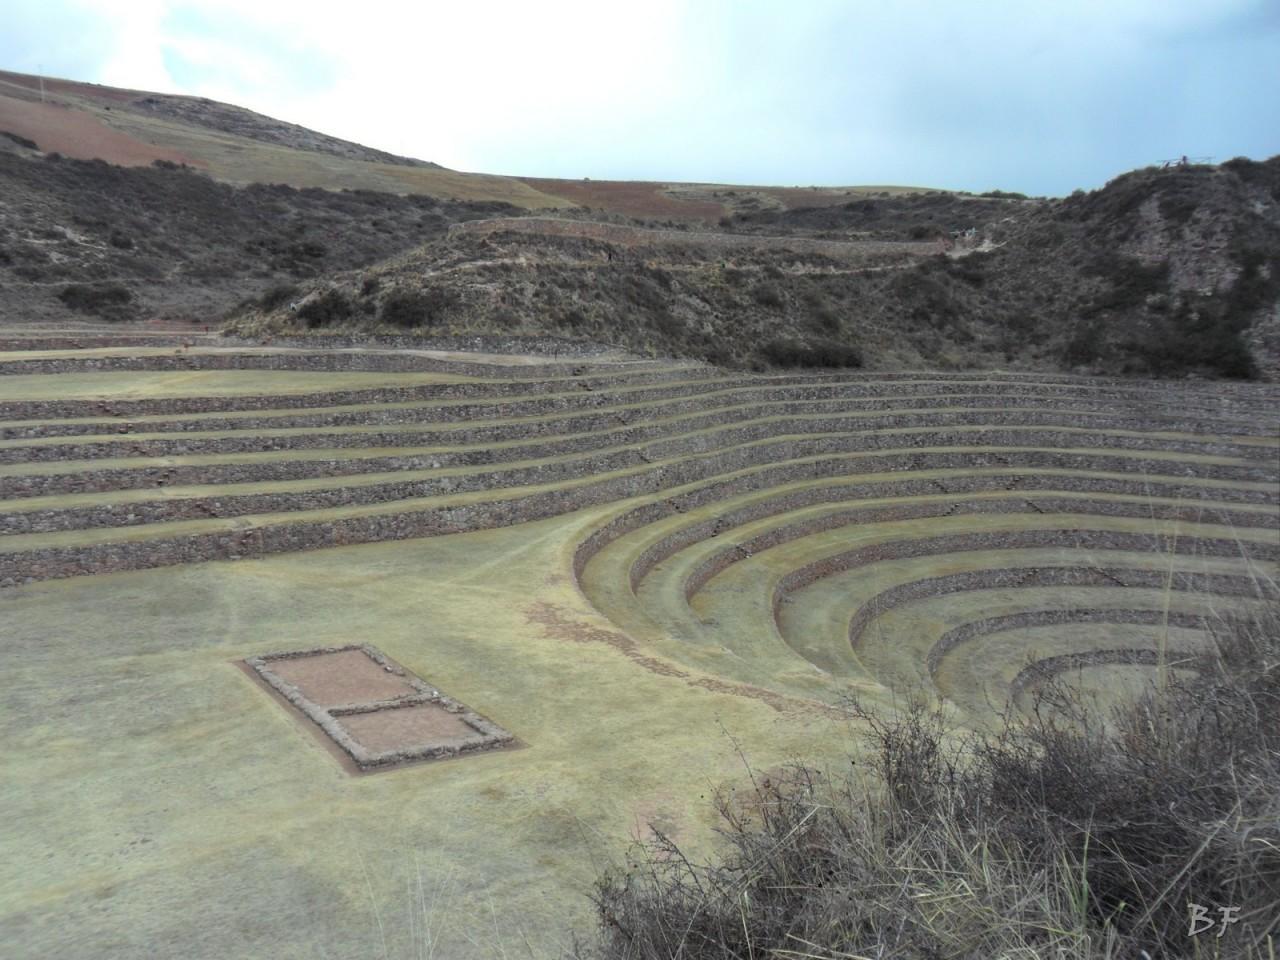 Terrazze-Circolari-Megaliti-Moray-Saline-Maras-Cusco-Perù-3